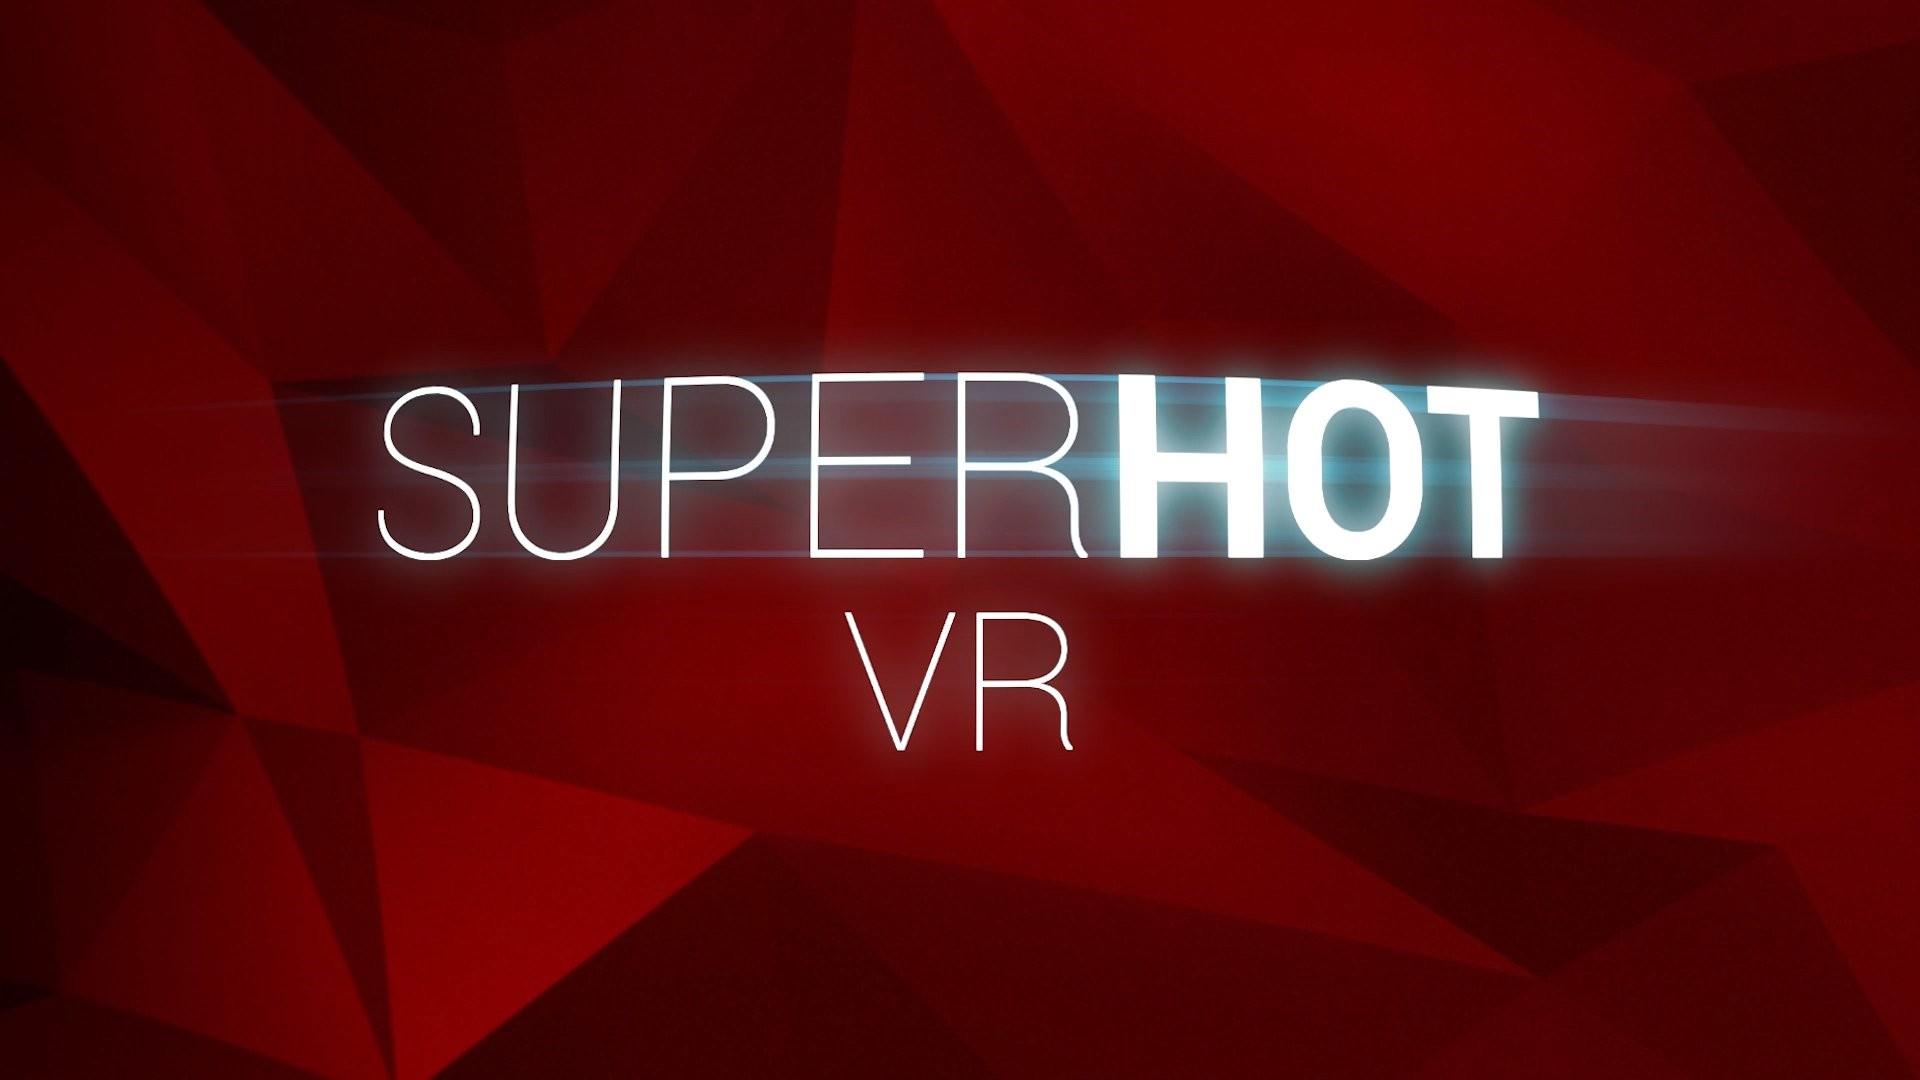 <b>射击游戏《SUPERHOT VR》将于今夏登陆PSVR</b>